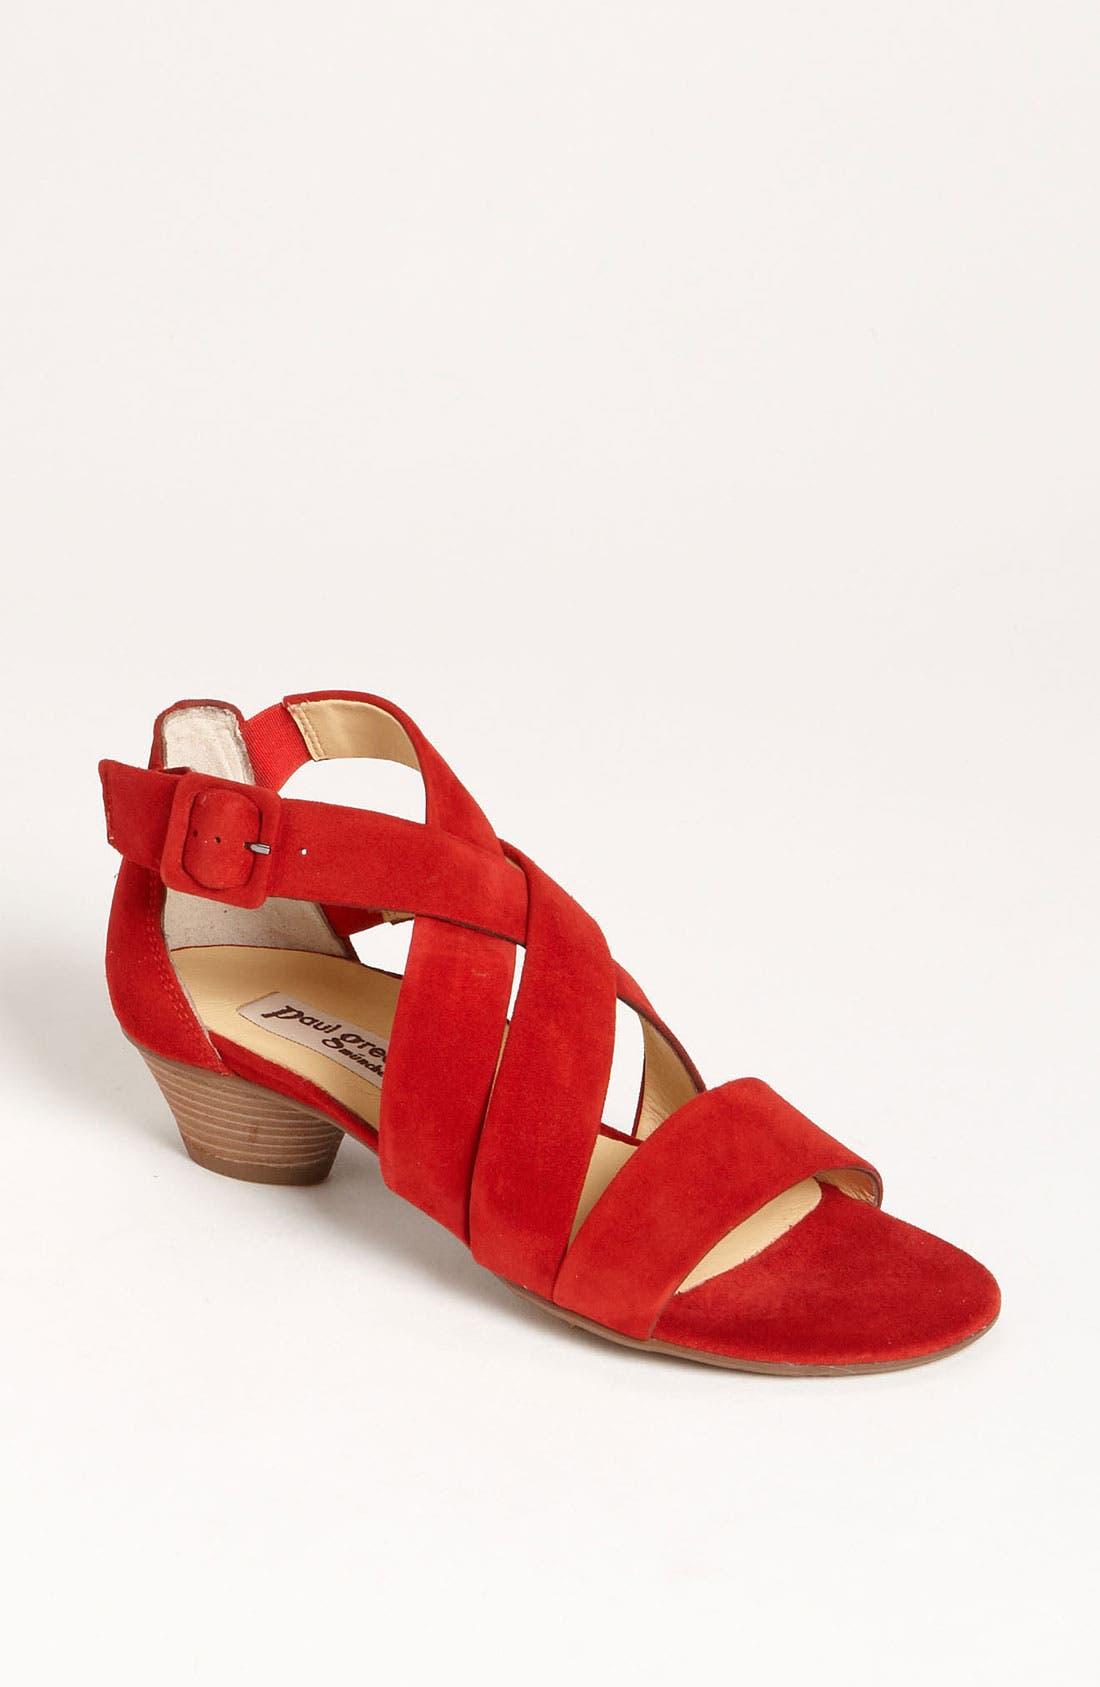 Alternate Image 1 Selected - Paul Green 'Lupe' Sandal